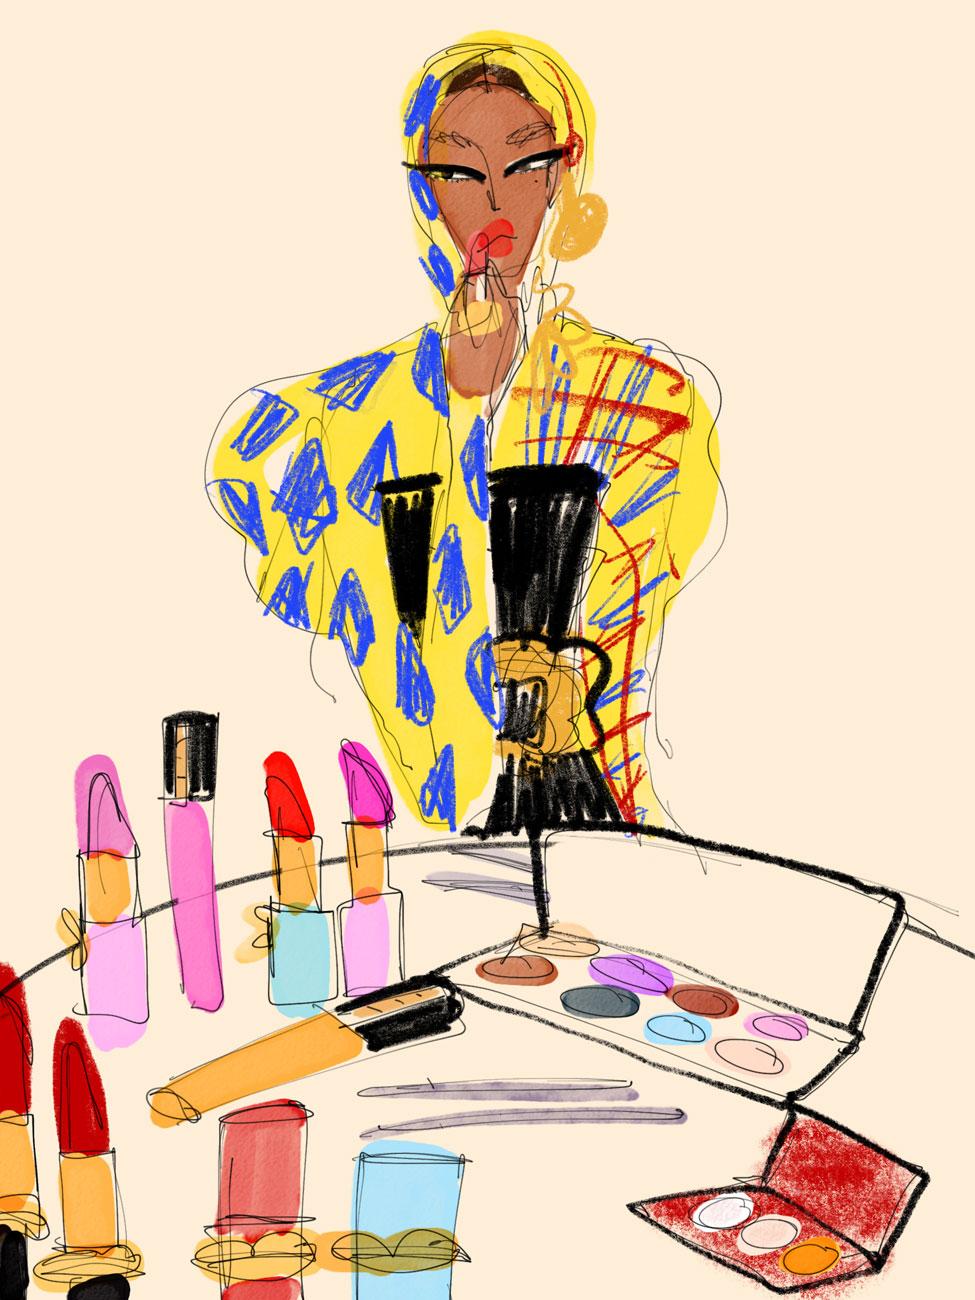 Versace-pat-mcgrath.jpg